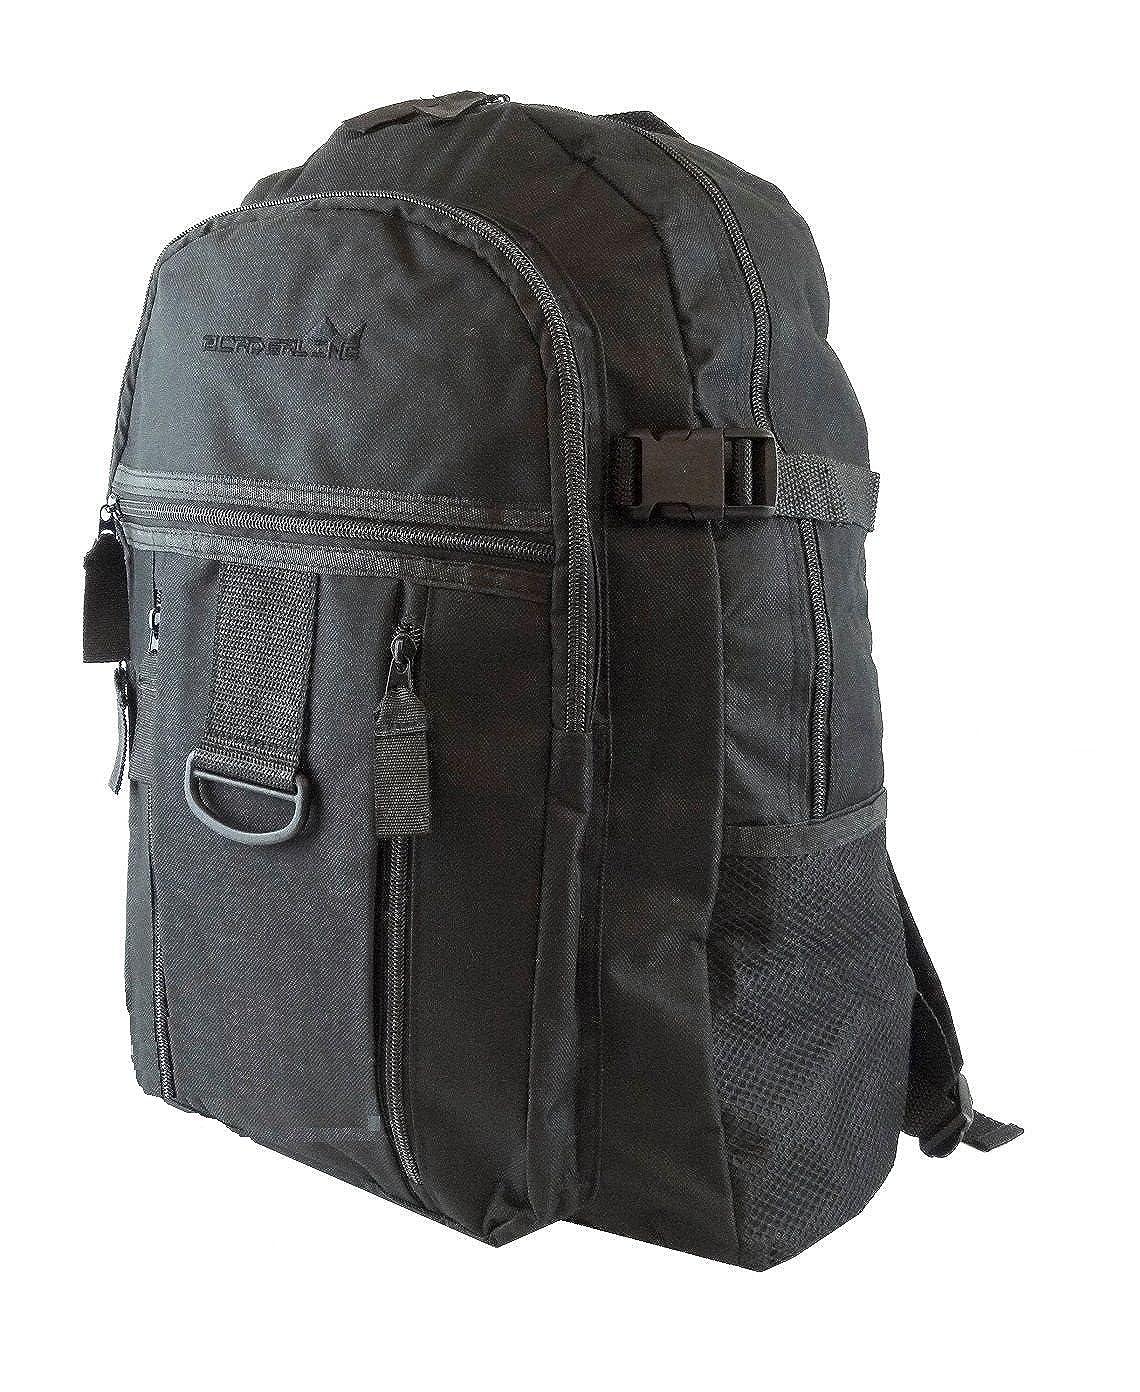 fac78ea077 Mens Boys Backpack Rucksack Sports Work Gym School Travel Hiking Man Bag  Pockets (Black/Black): Amazon.co.uk: Clothing